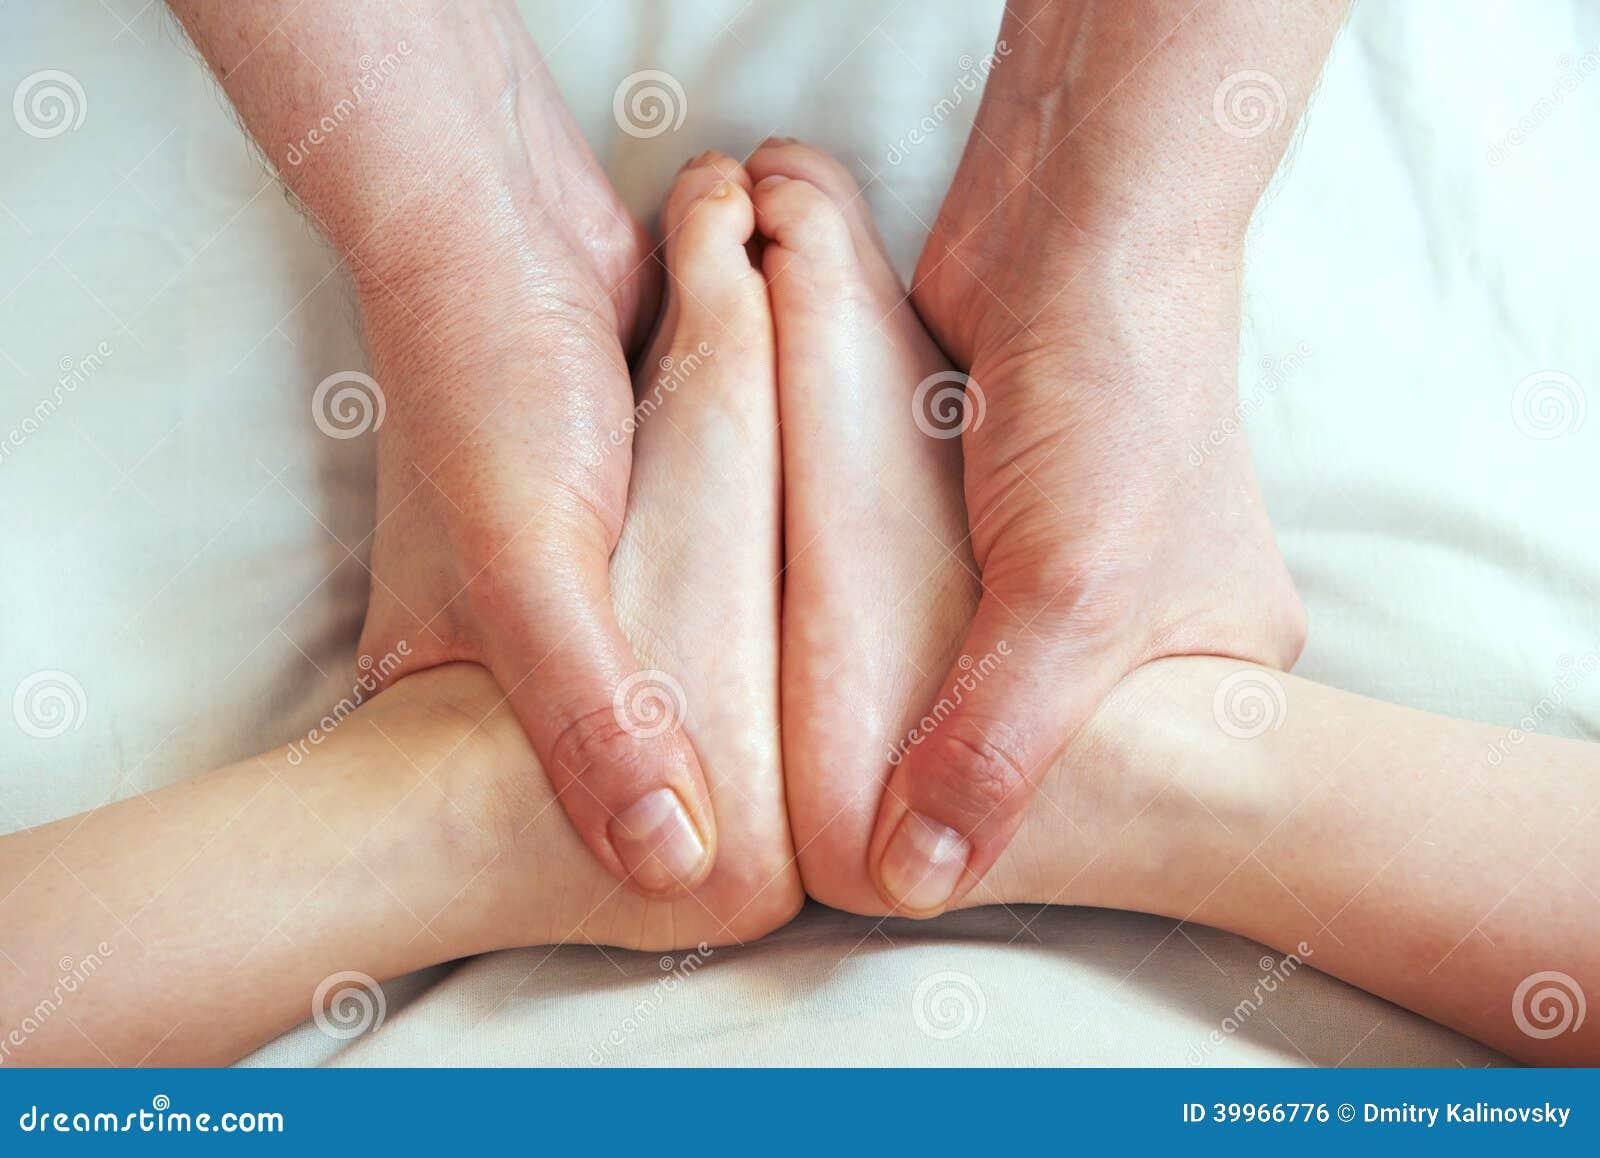 gratis  com erotische body to body massage